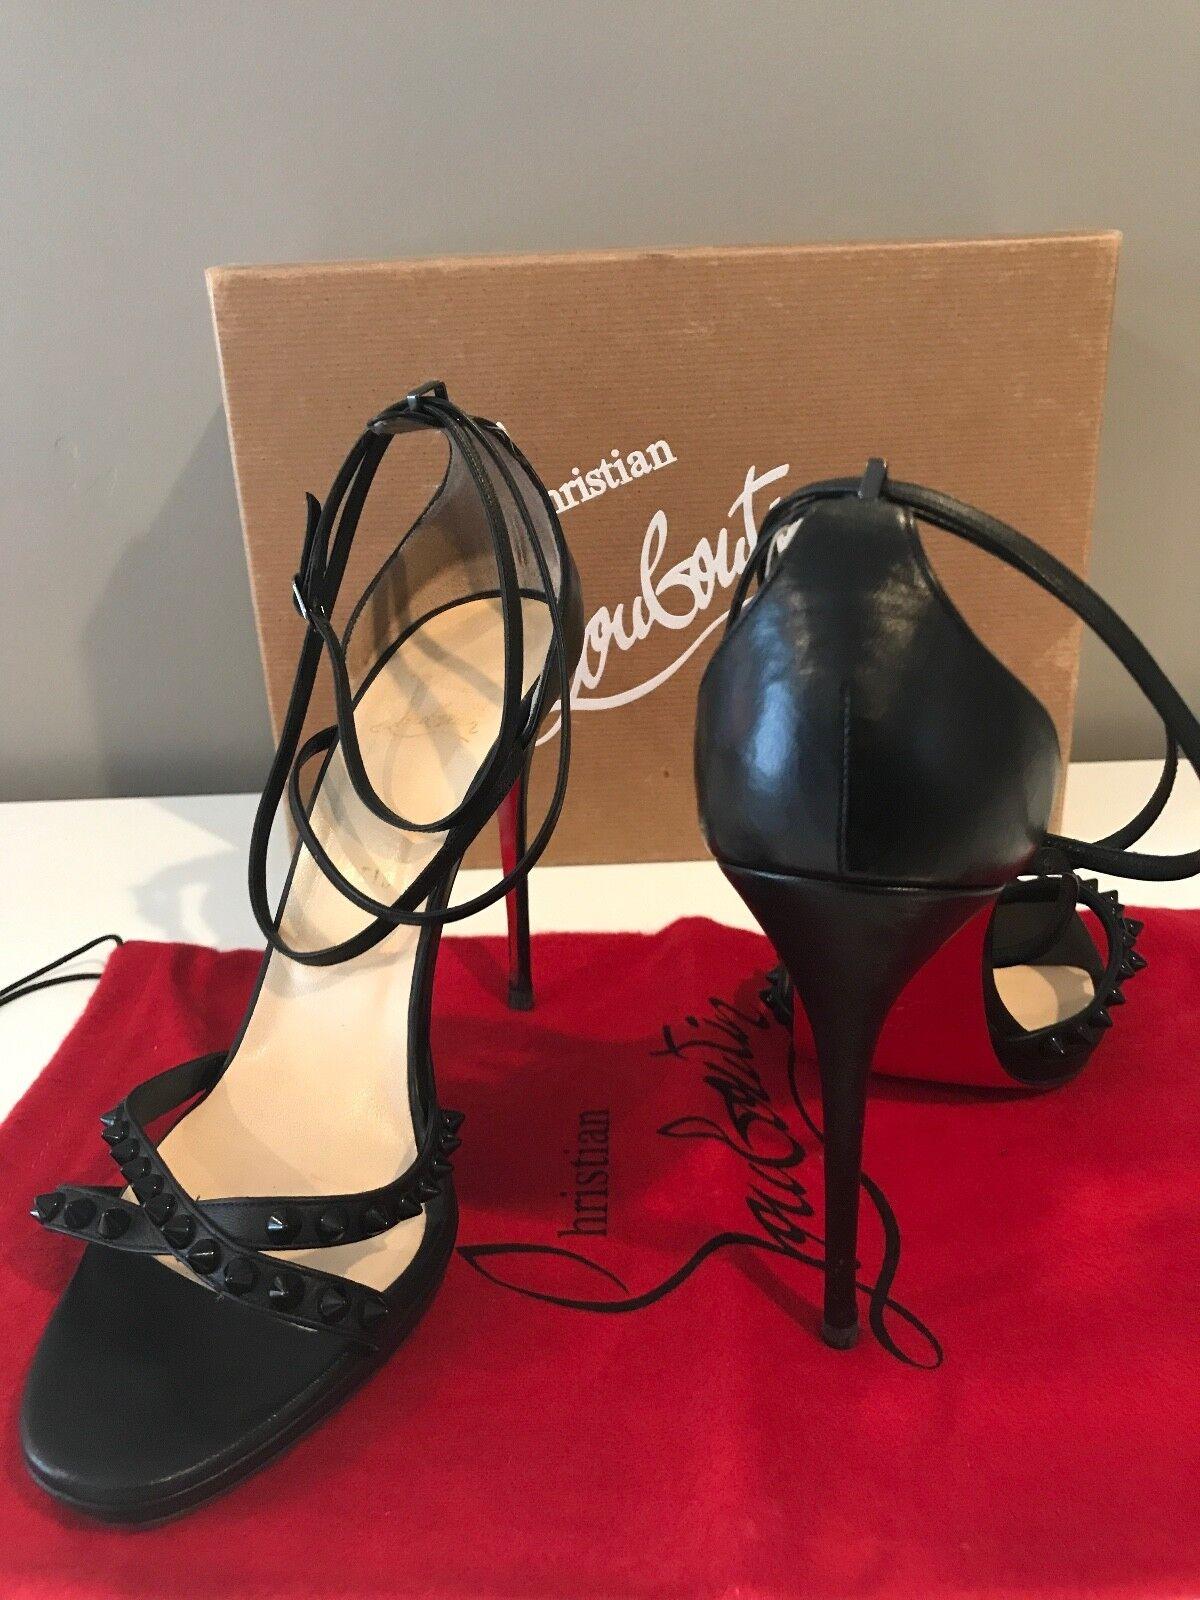 Christian Louboutin Monocronana Monocronana Monocronana 120 KID Studded Strappy Leather Open Toe Größe 40 10cafe